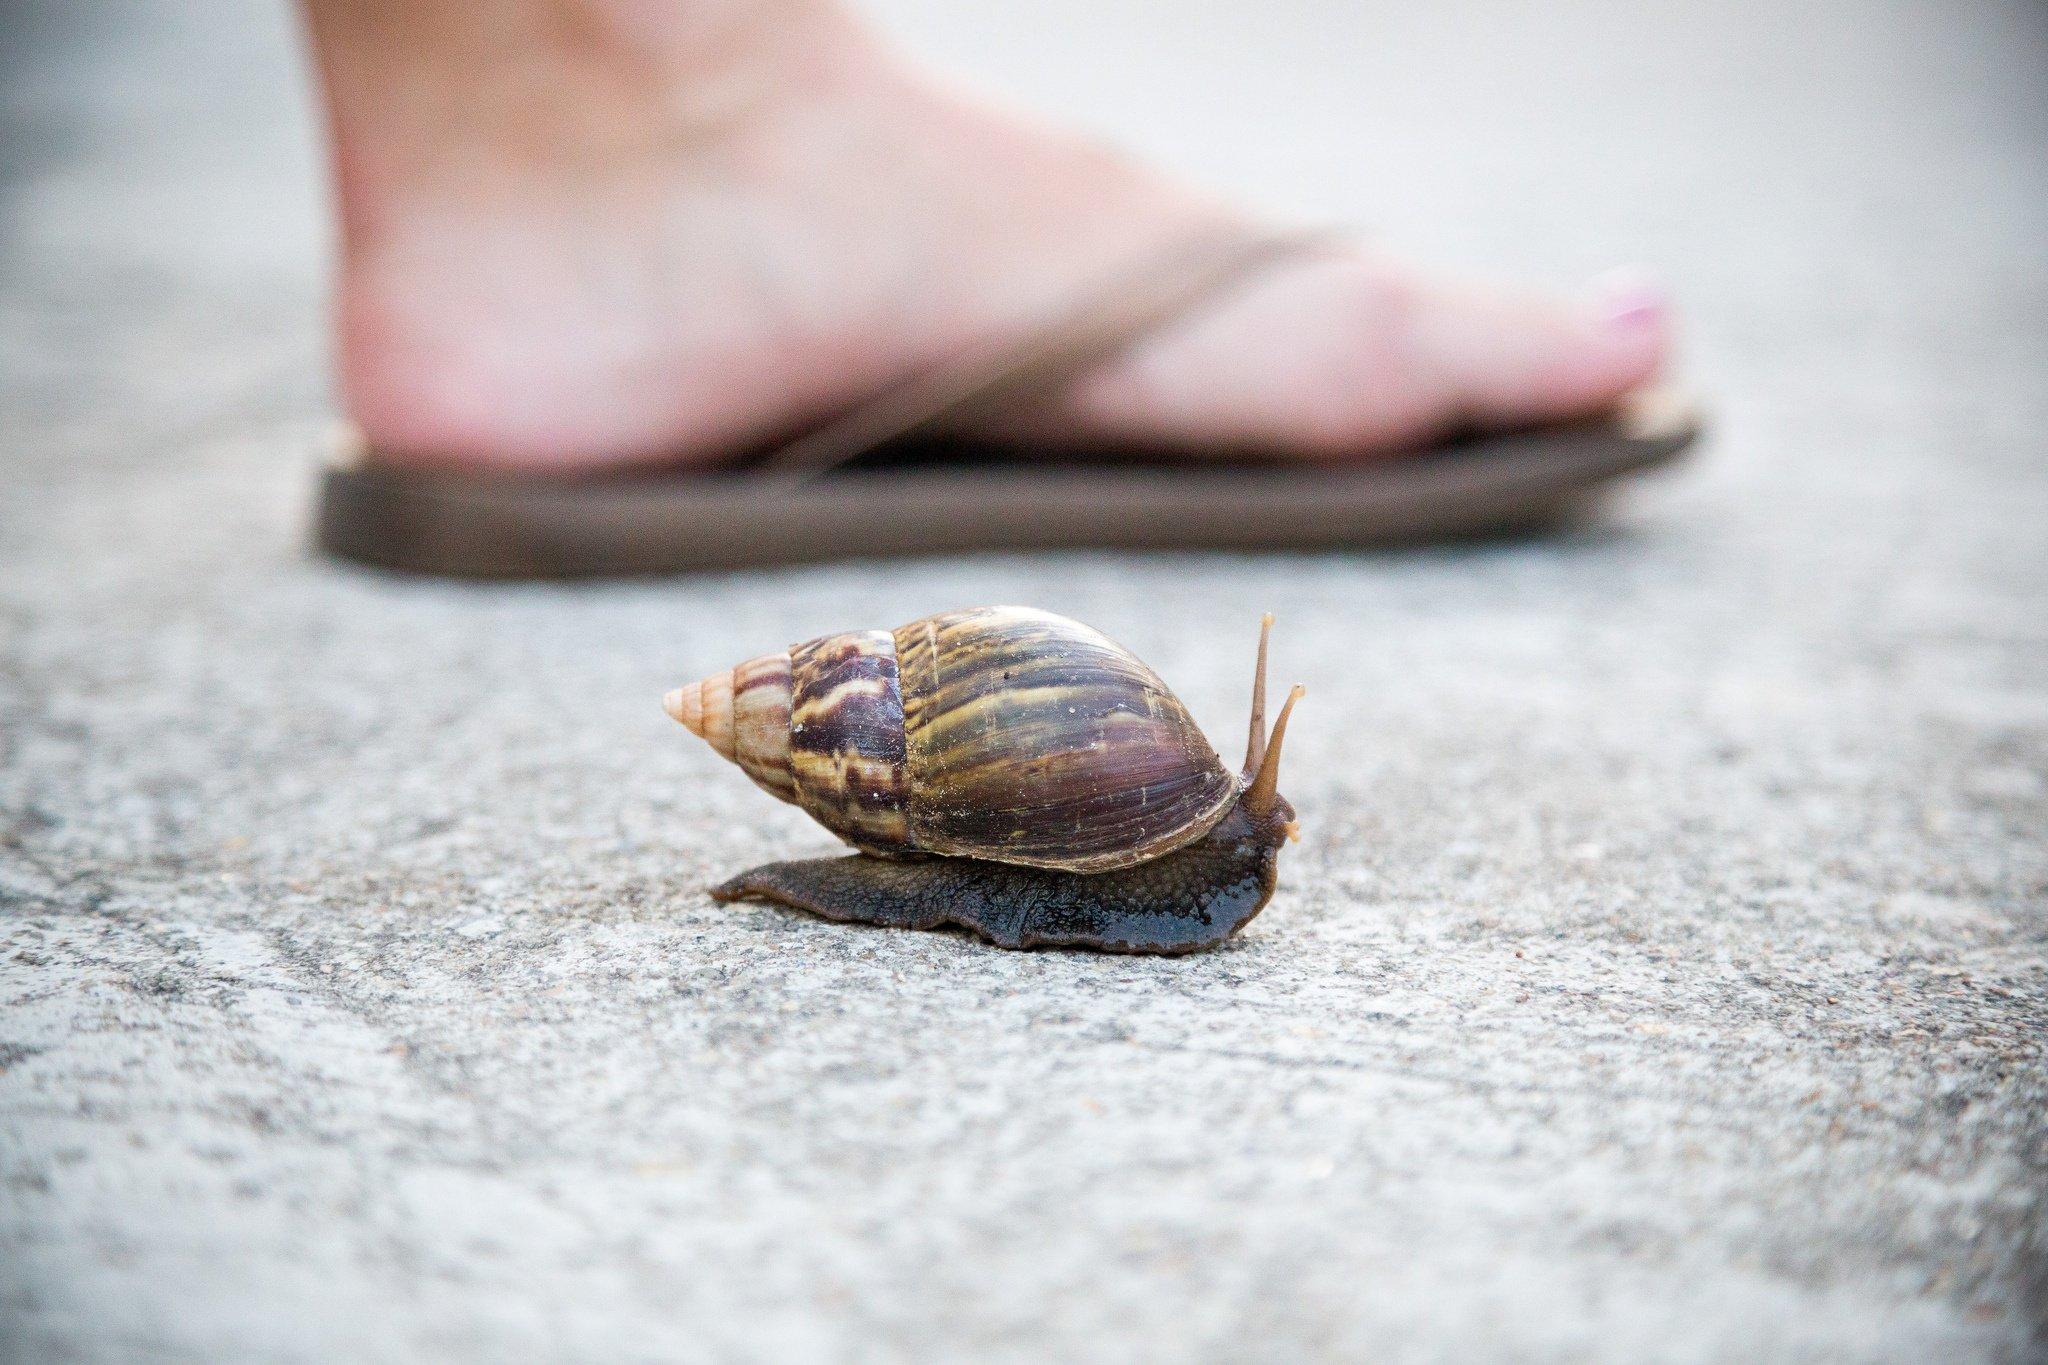 Snail crawling next to a person walking